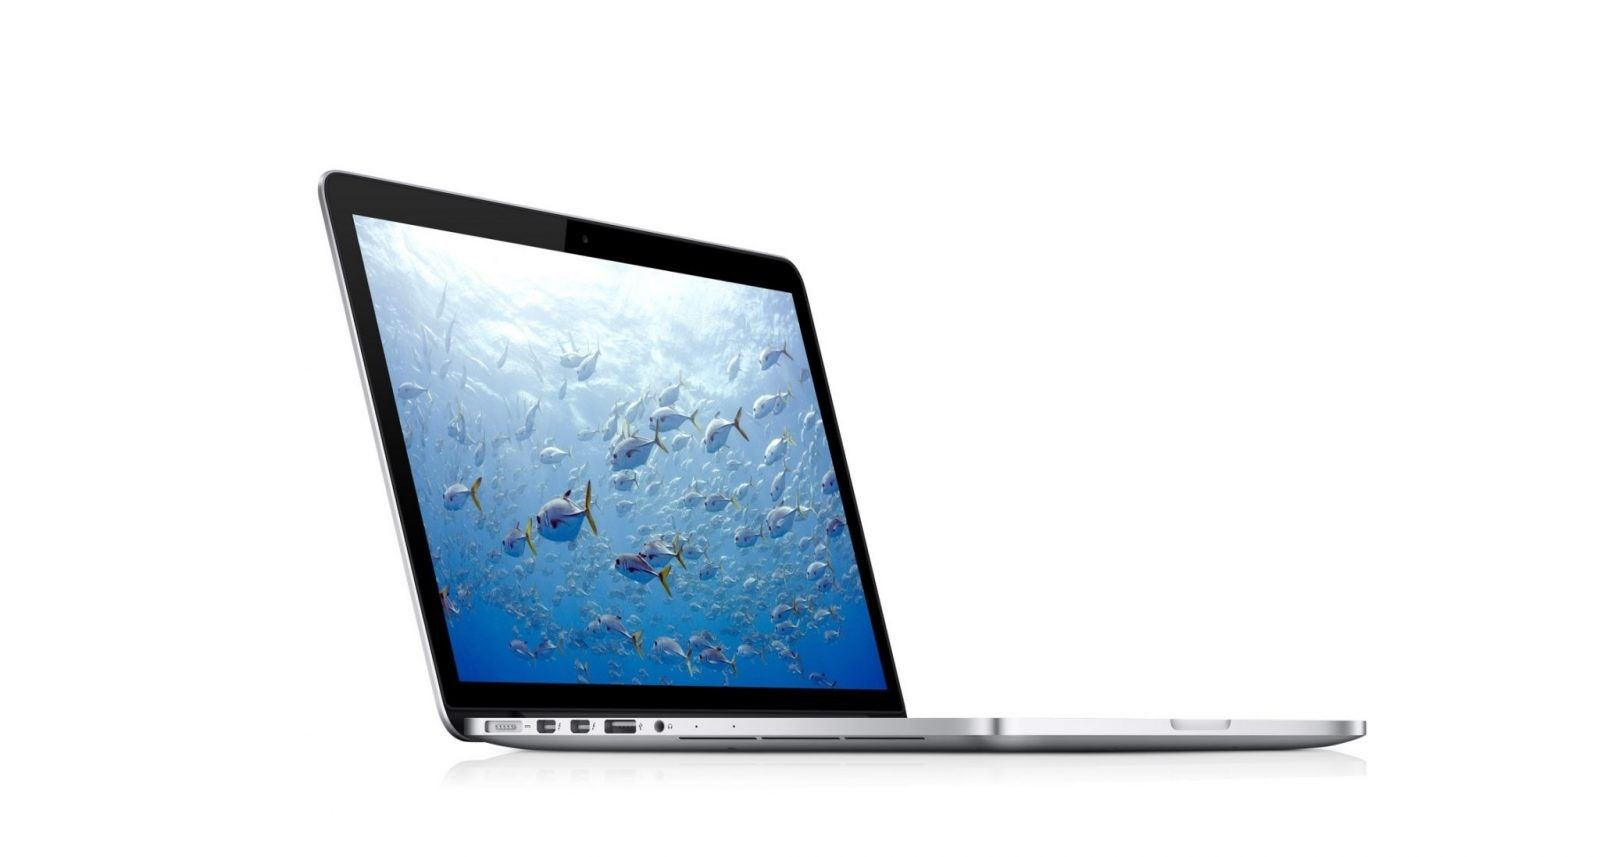 Nowe Macbooki Pro Retina i kolejne problemy